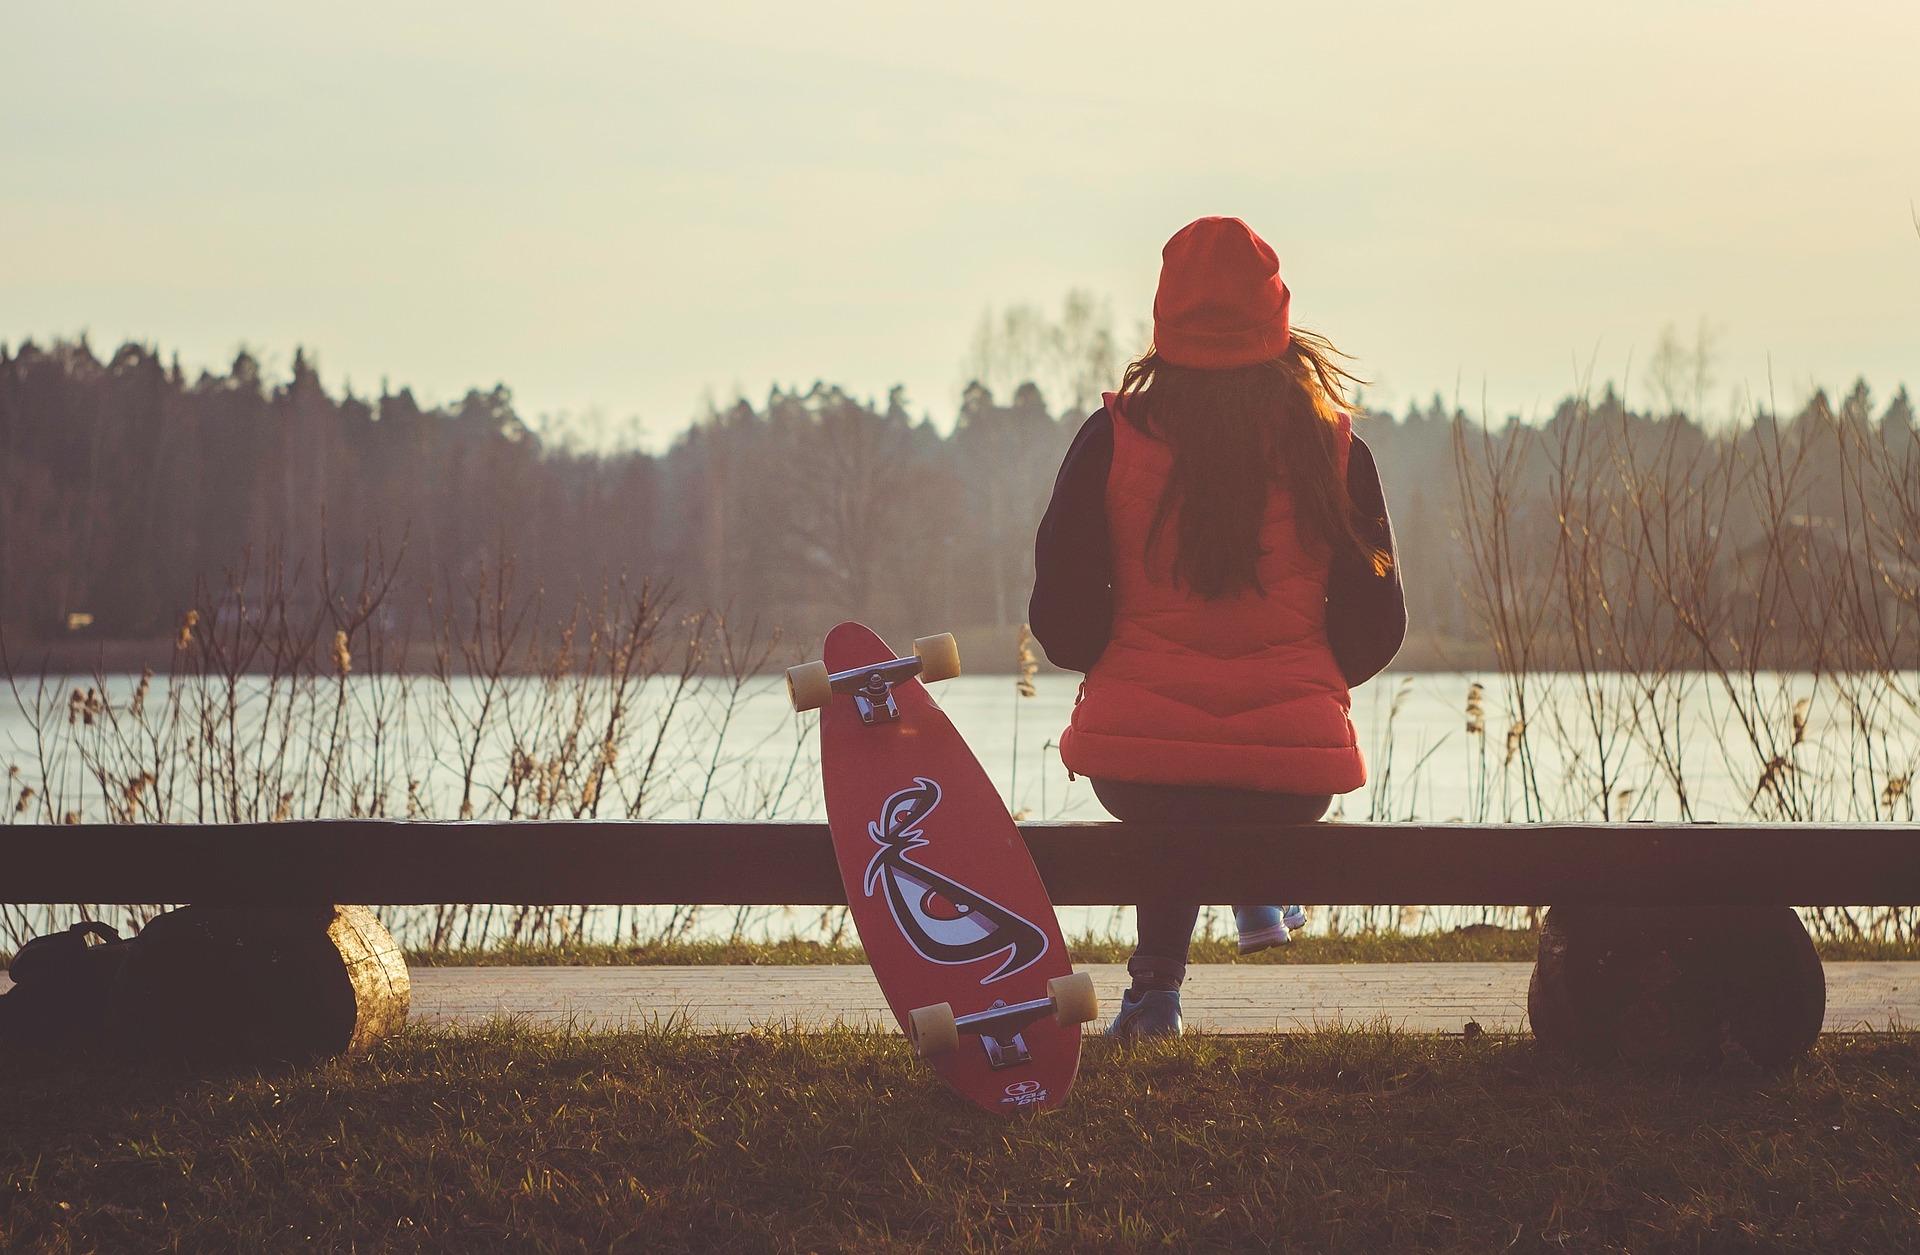 Skateboard Freizeitbeschaeftigung